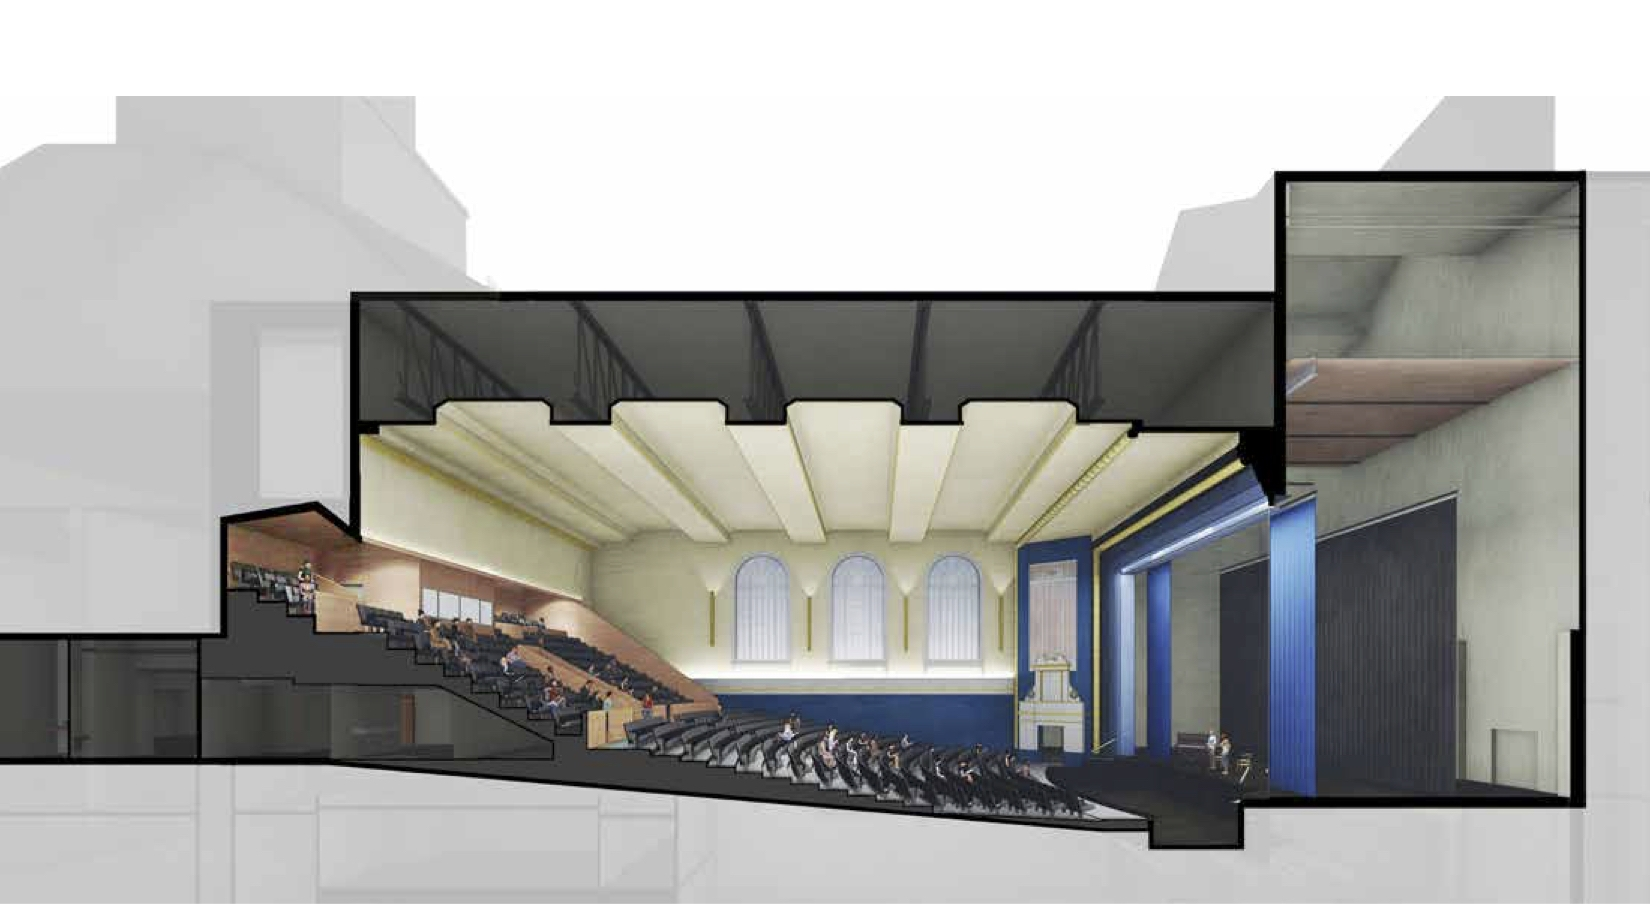 Hope High Auditorium_Public Presentation_v2.jpg